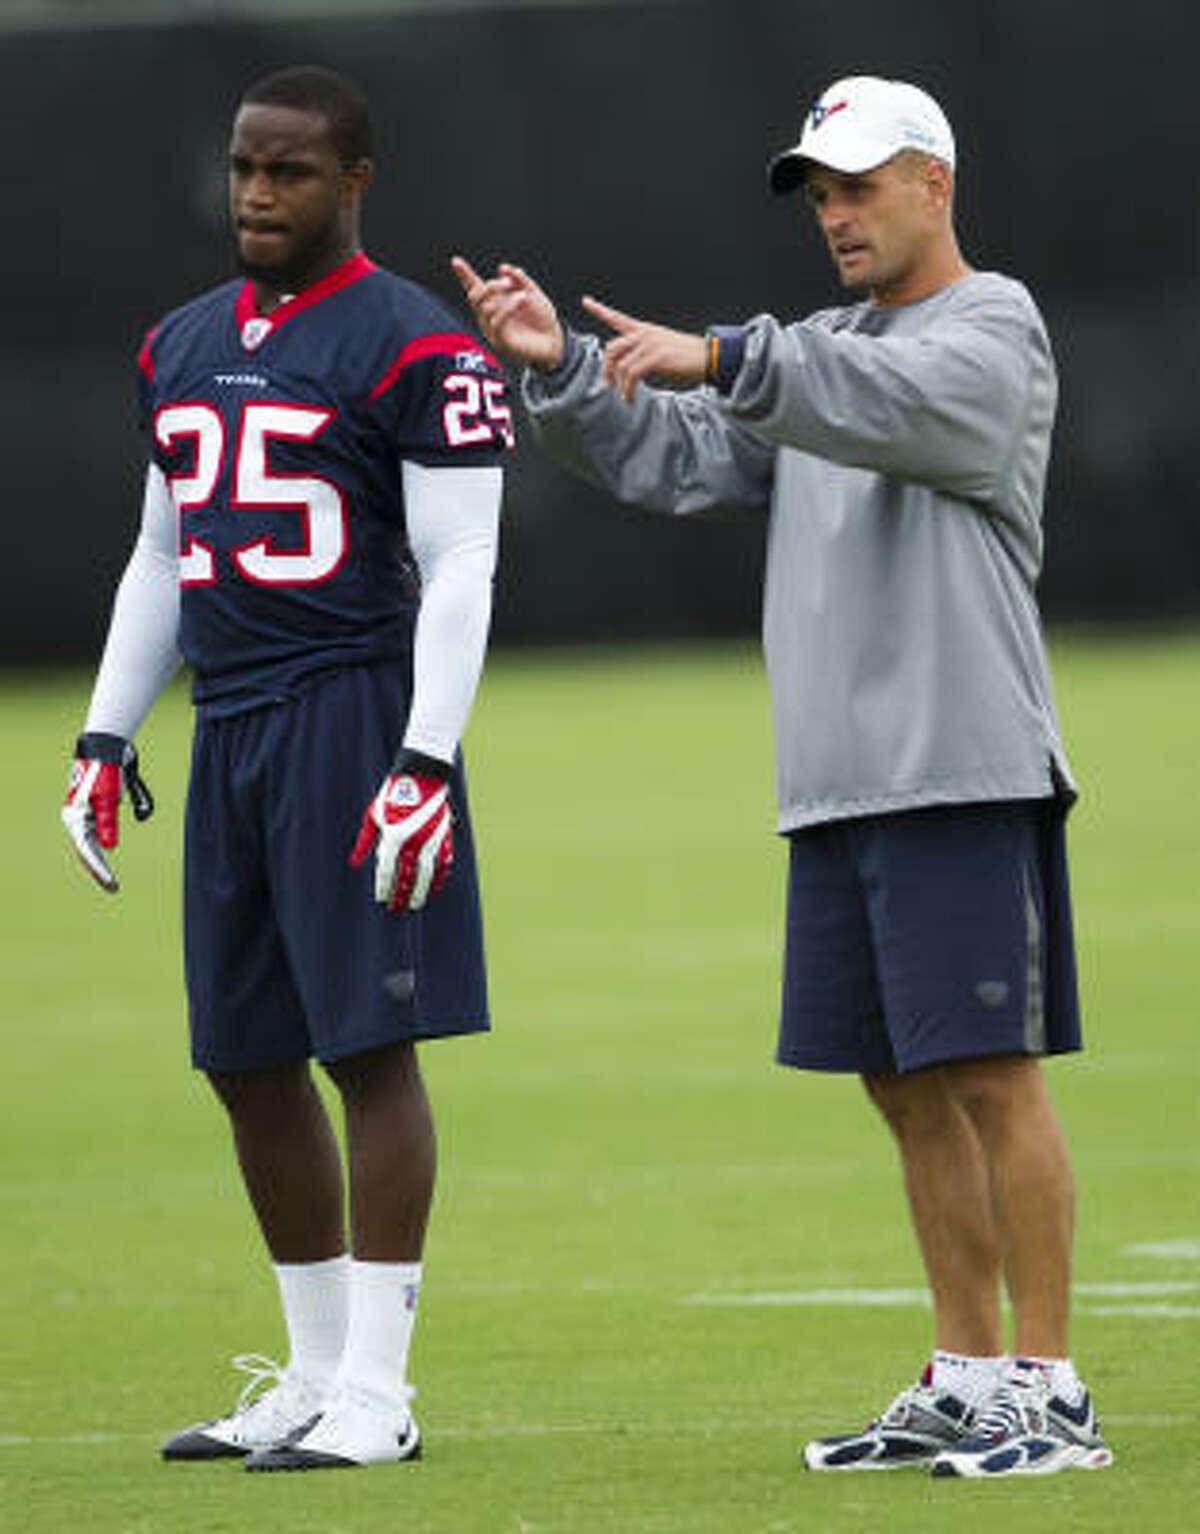 Texans defensive backs coach David Gibbs, right, works with rookie cornerback Kareem Jackson.